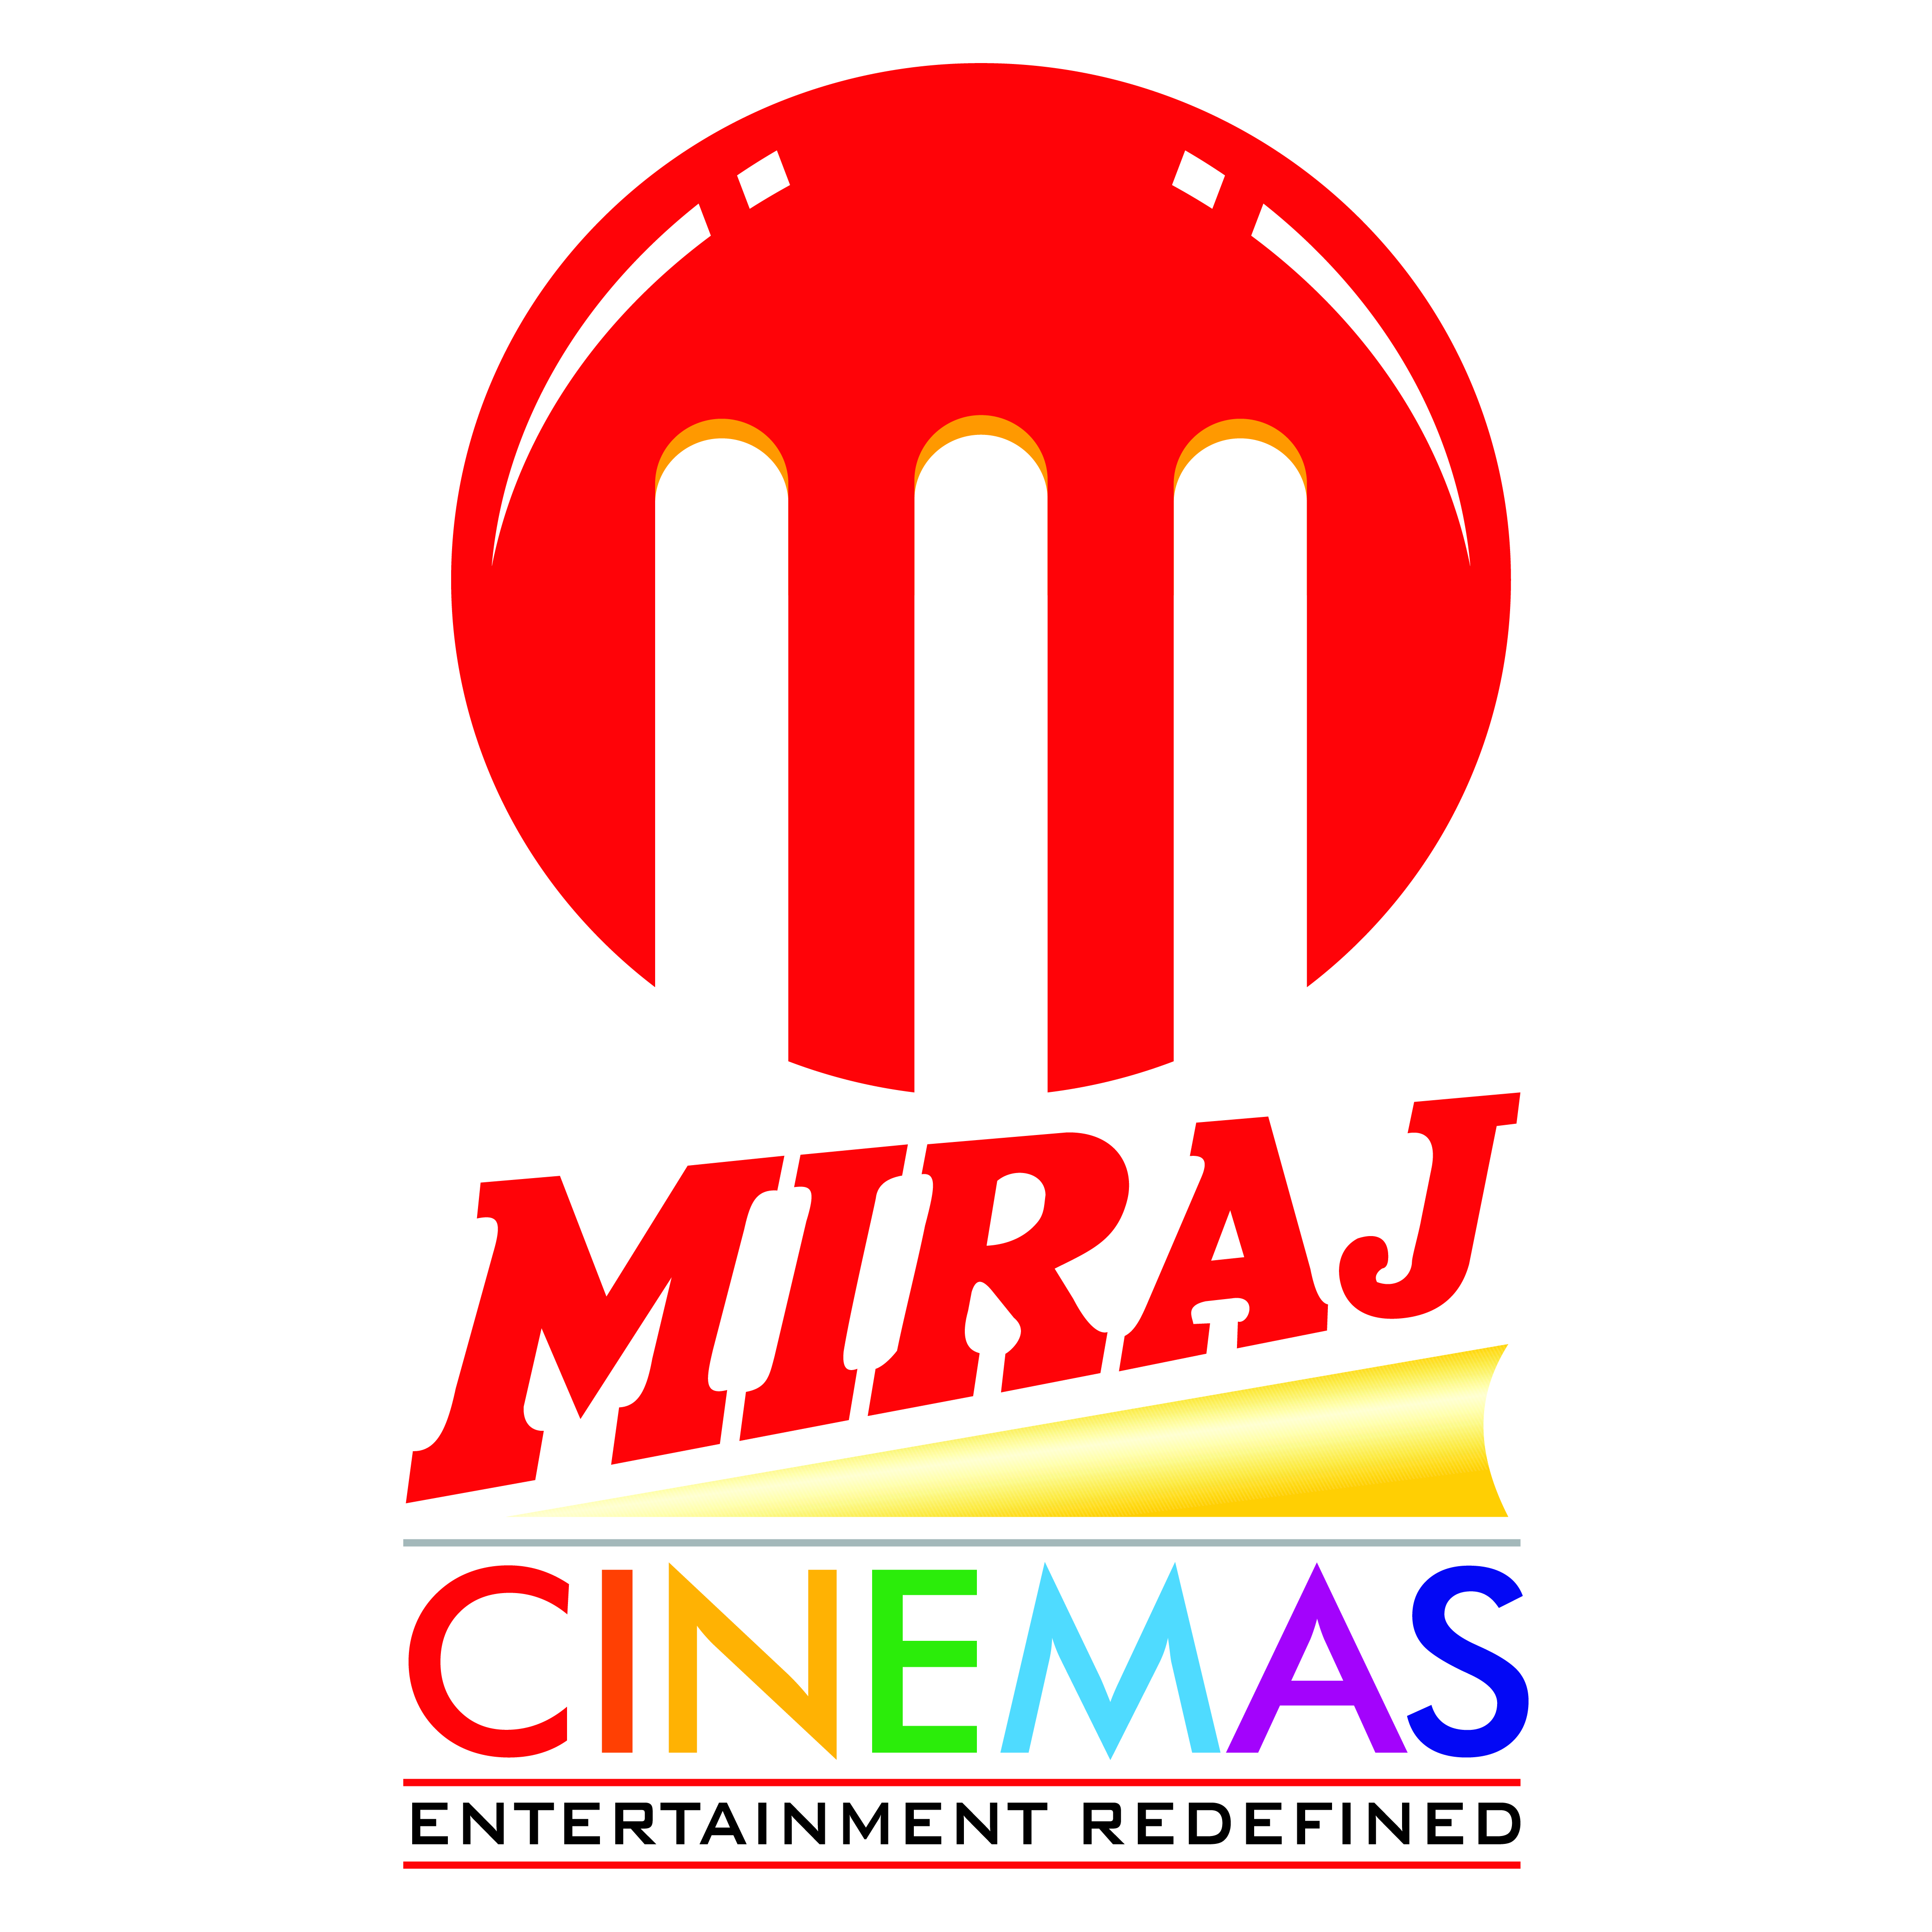 Miraj Cinemas - Wikipedia